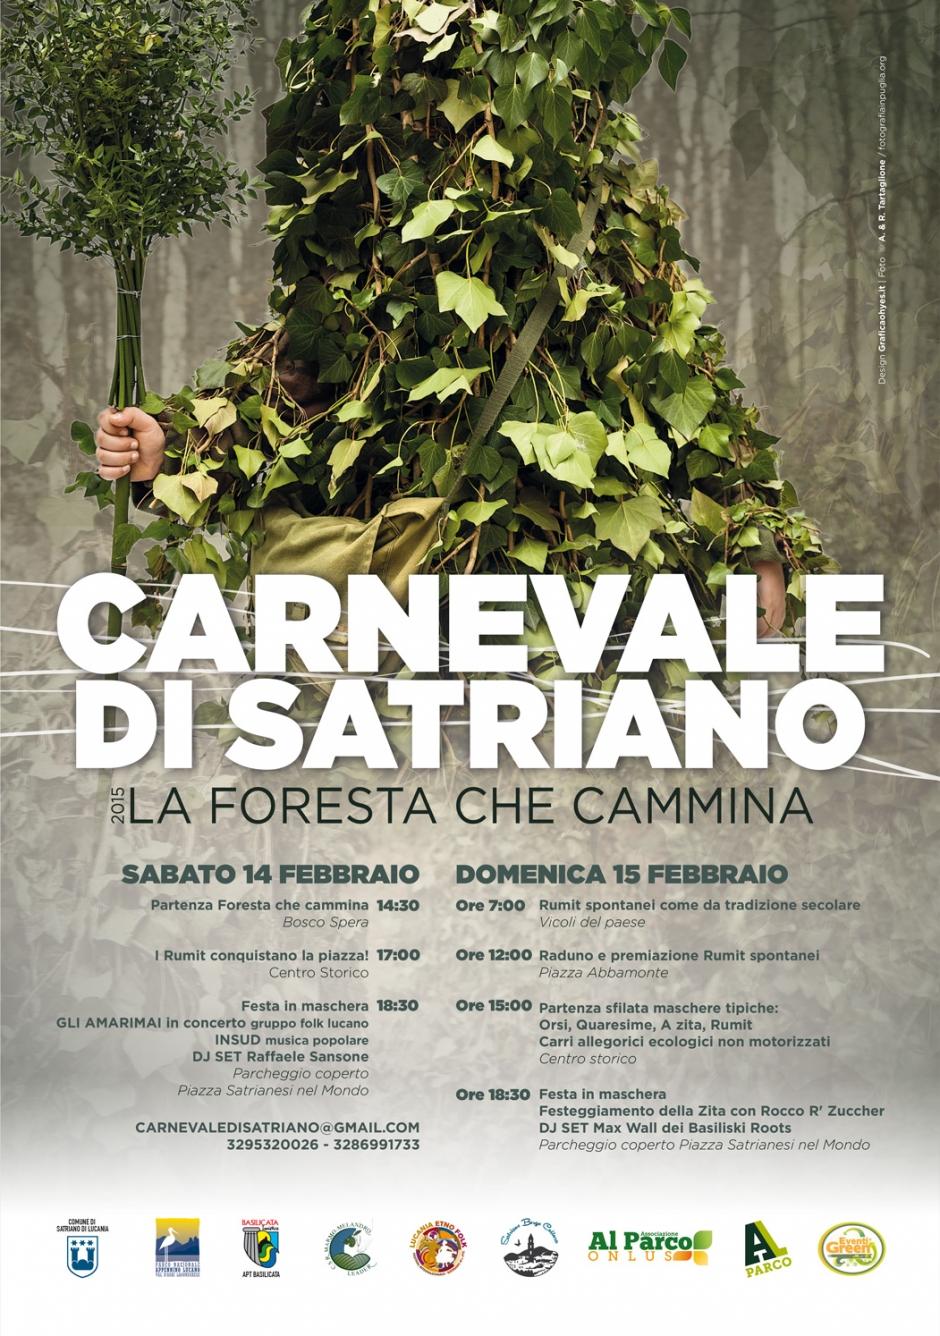 Carnevale di Satriano 2015 b48b52444b6